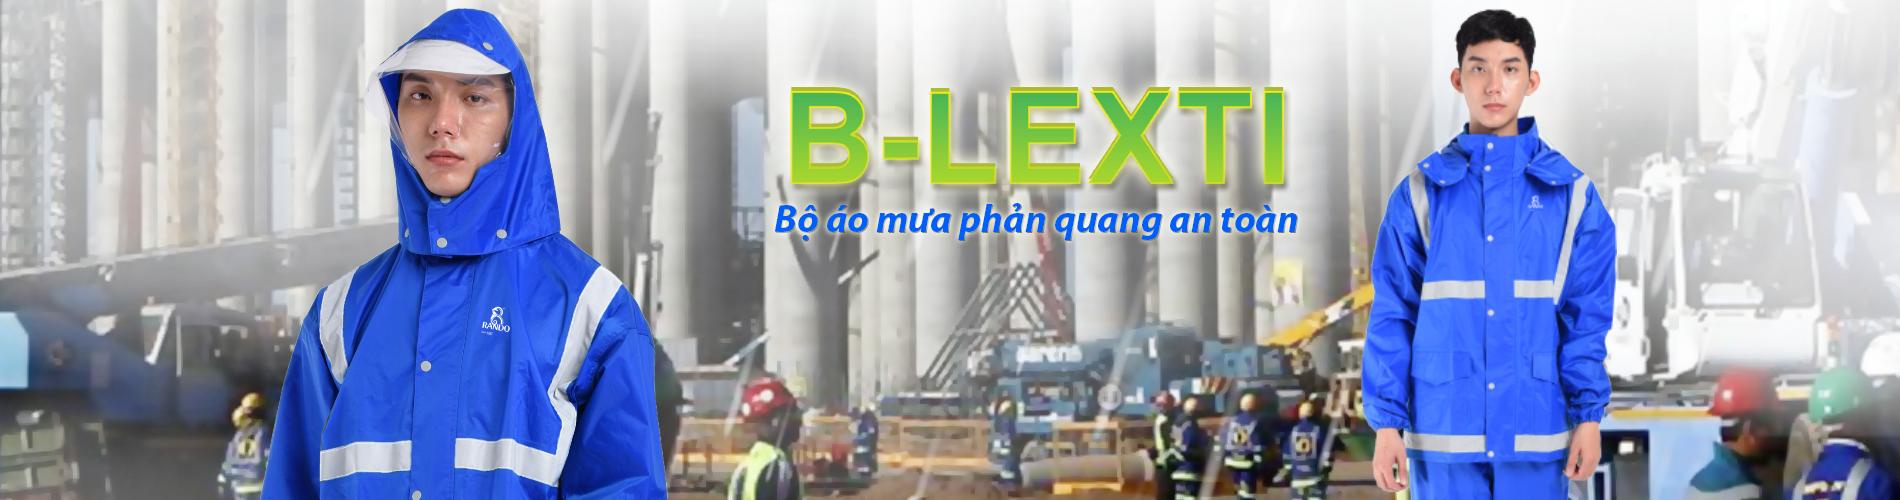 Bộ áo mưa B-Lexti